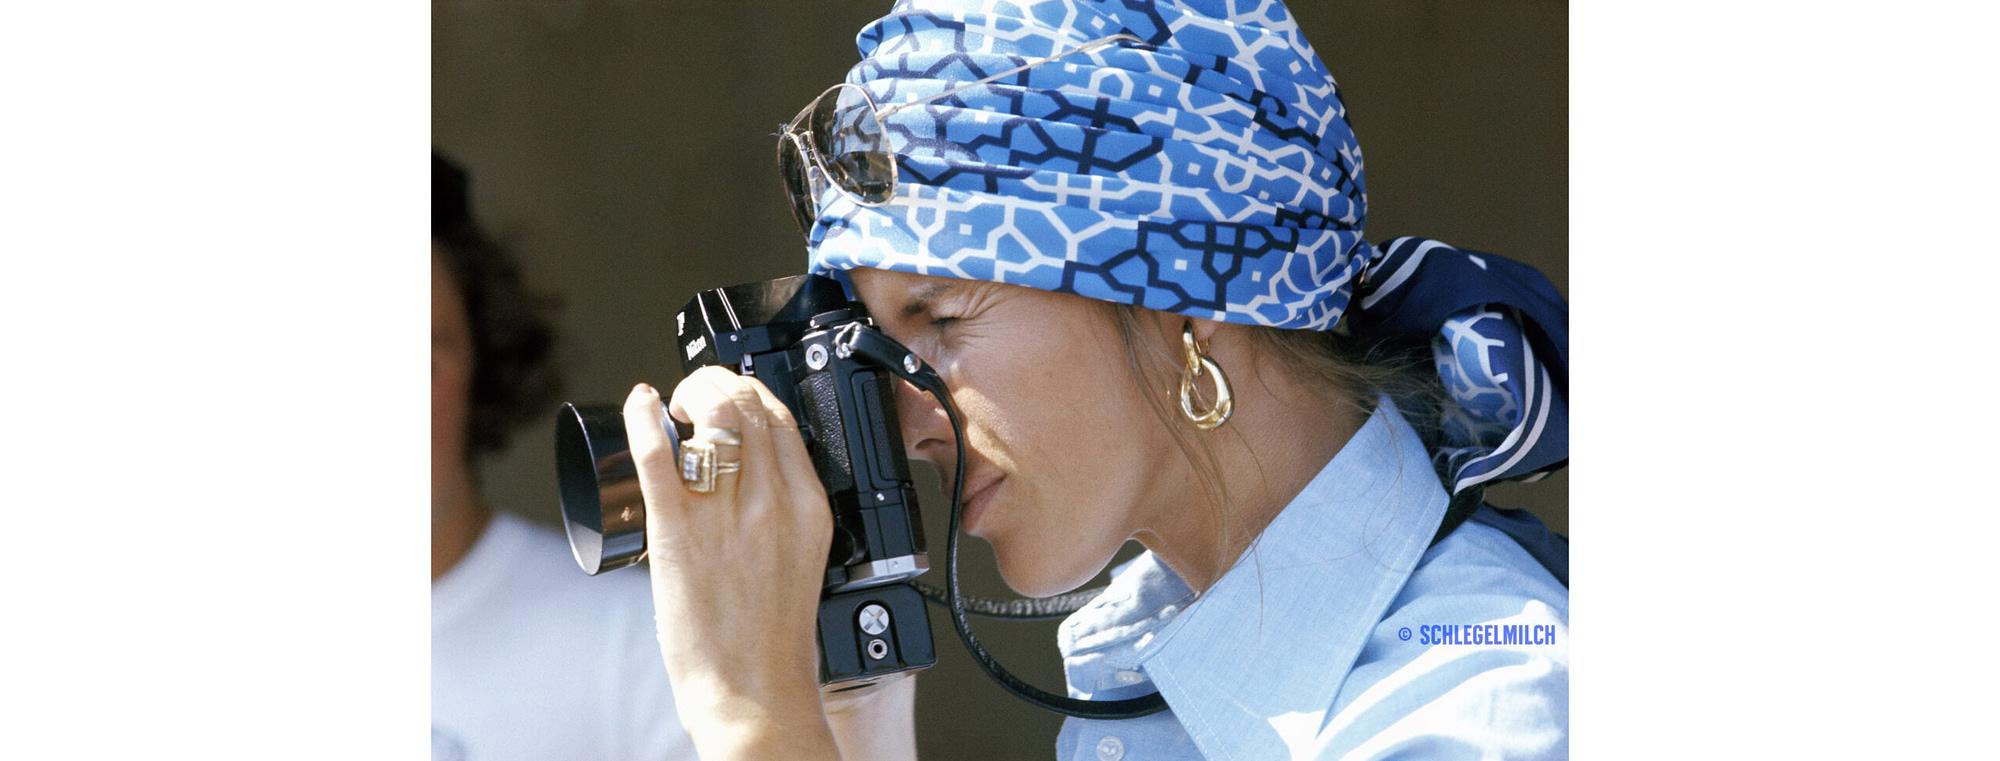 Helen Stewart Austrian GP 1973 now suffering from Dementia